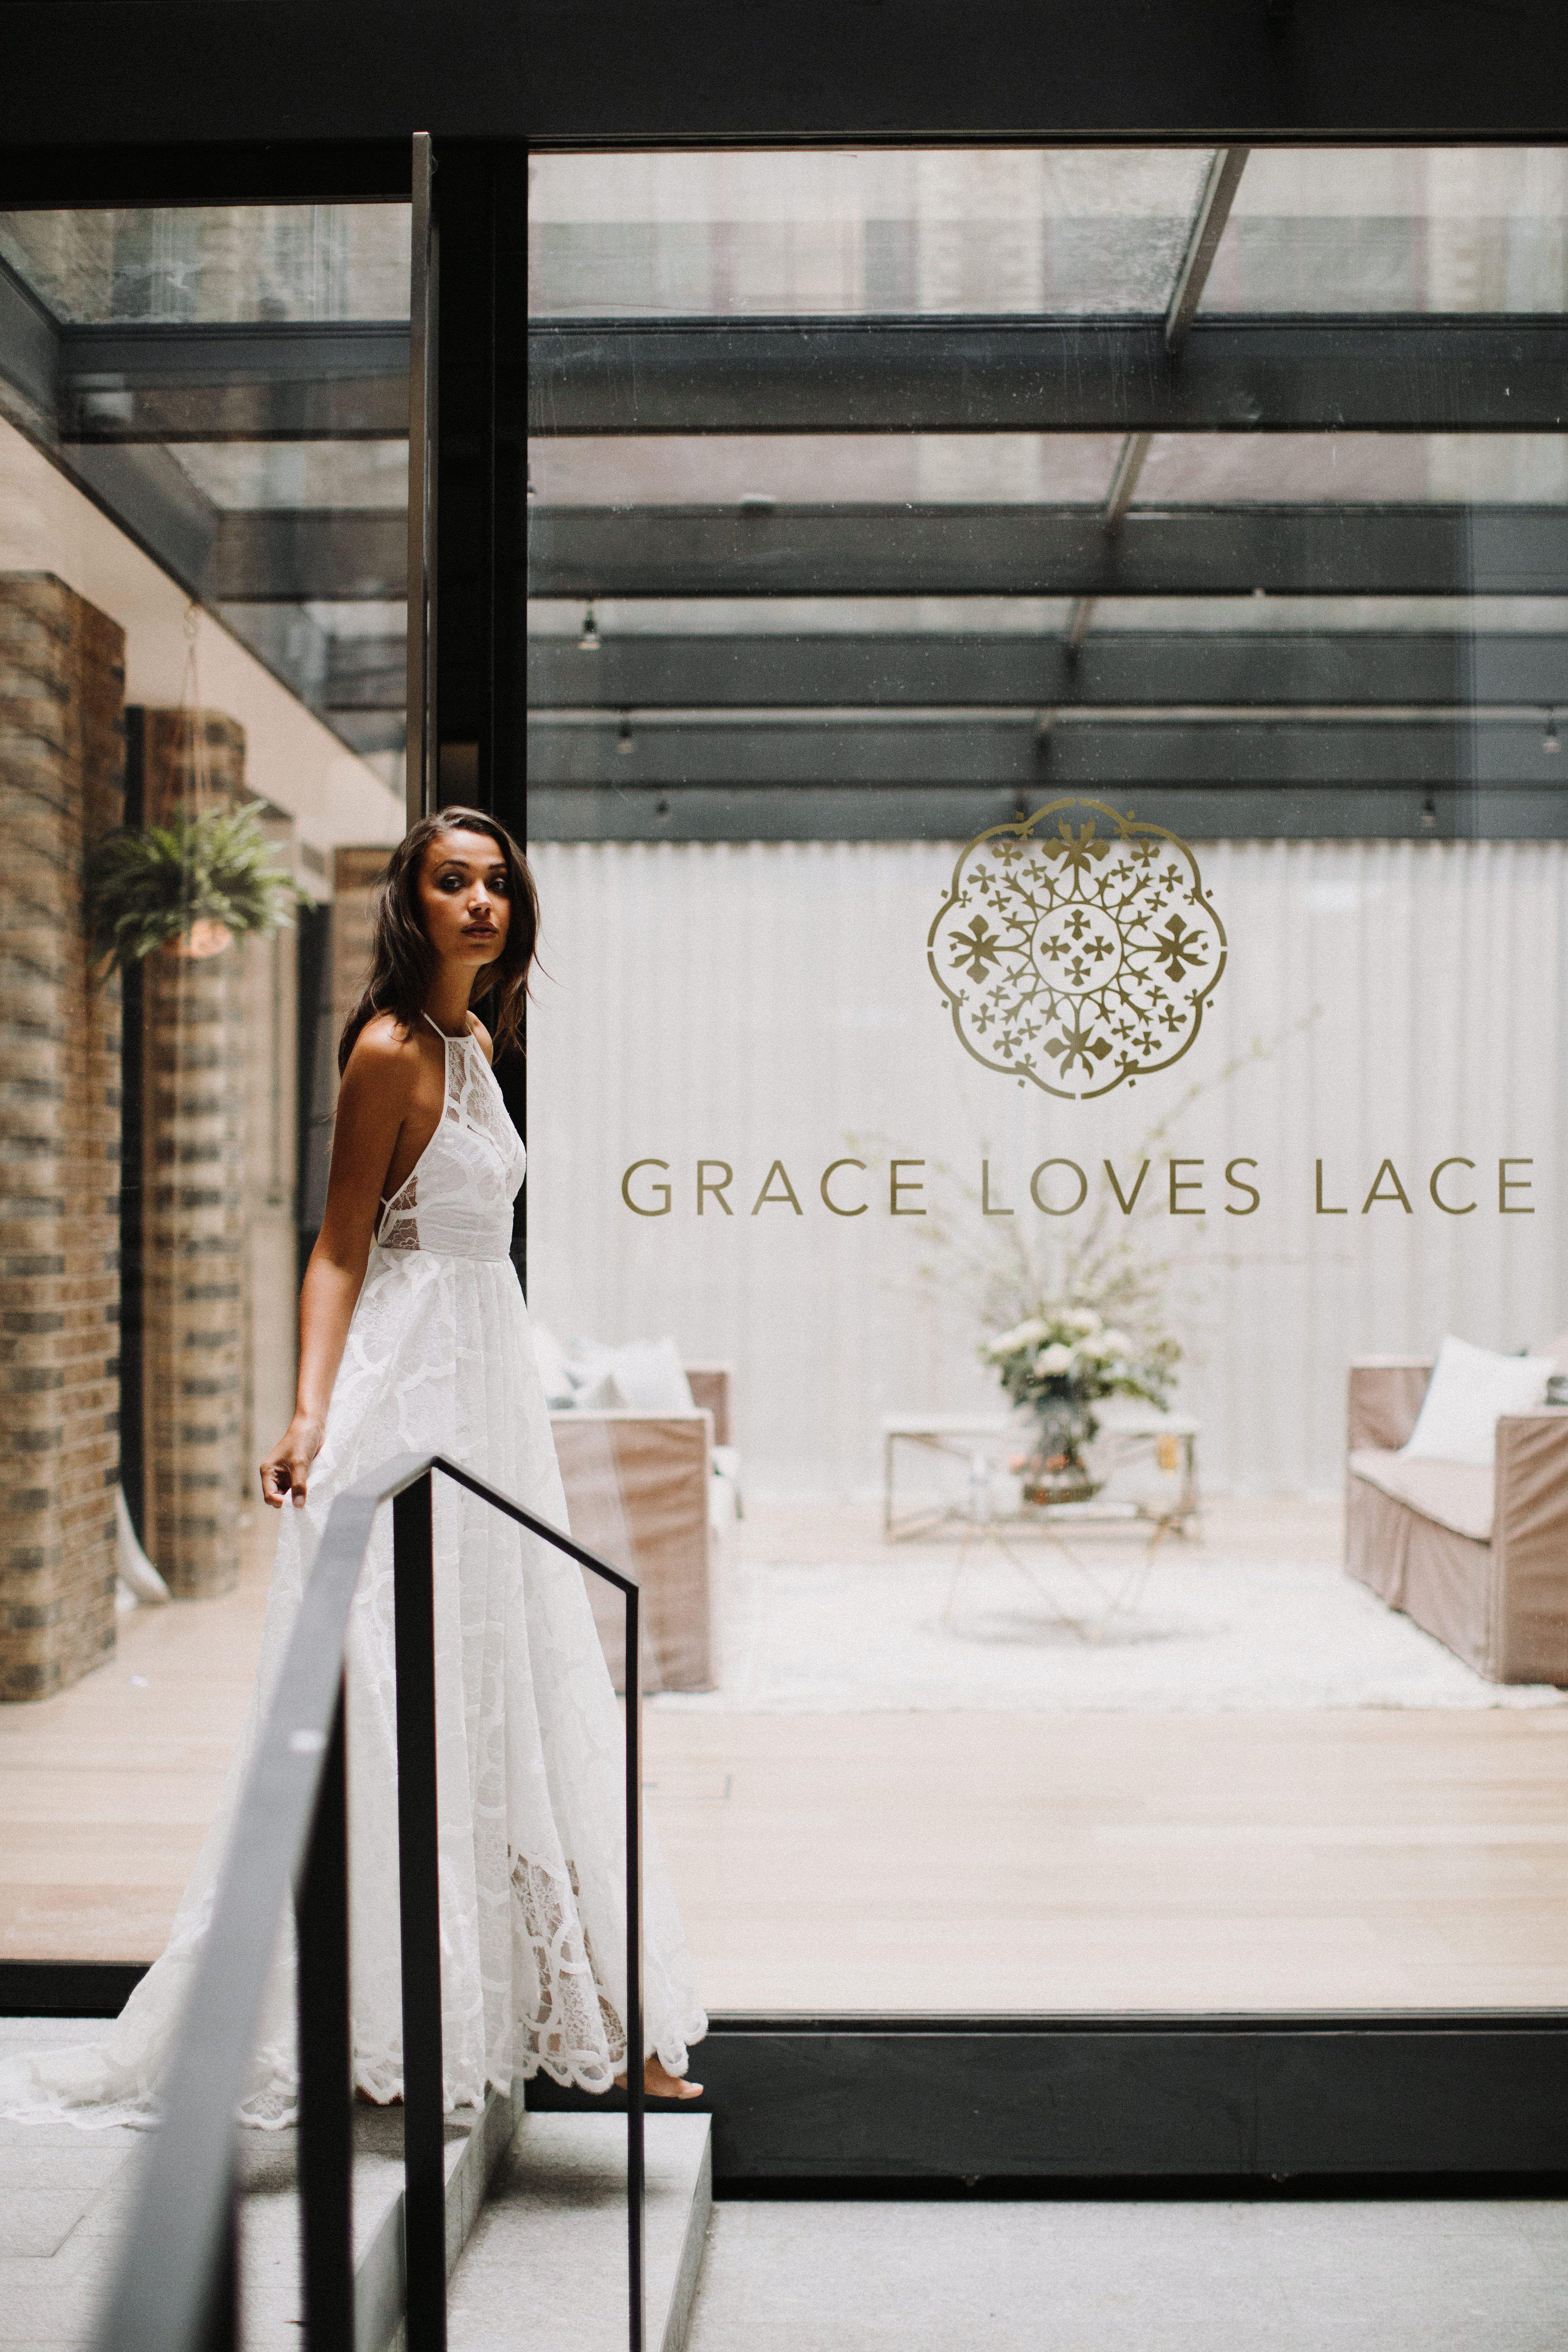 London Showroom Grace loves lace, Dresses, Wedding dresses